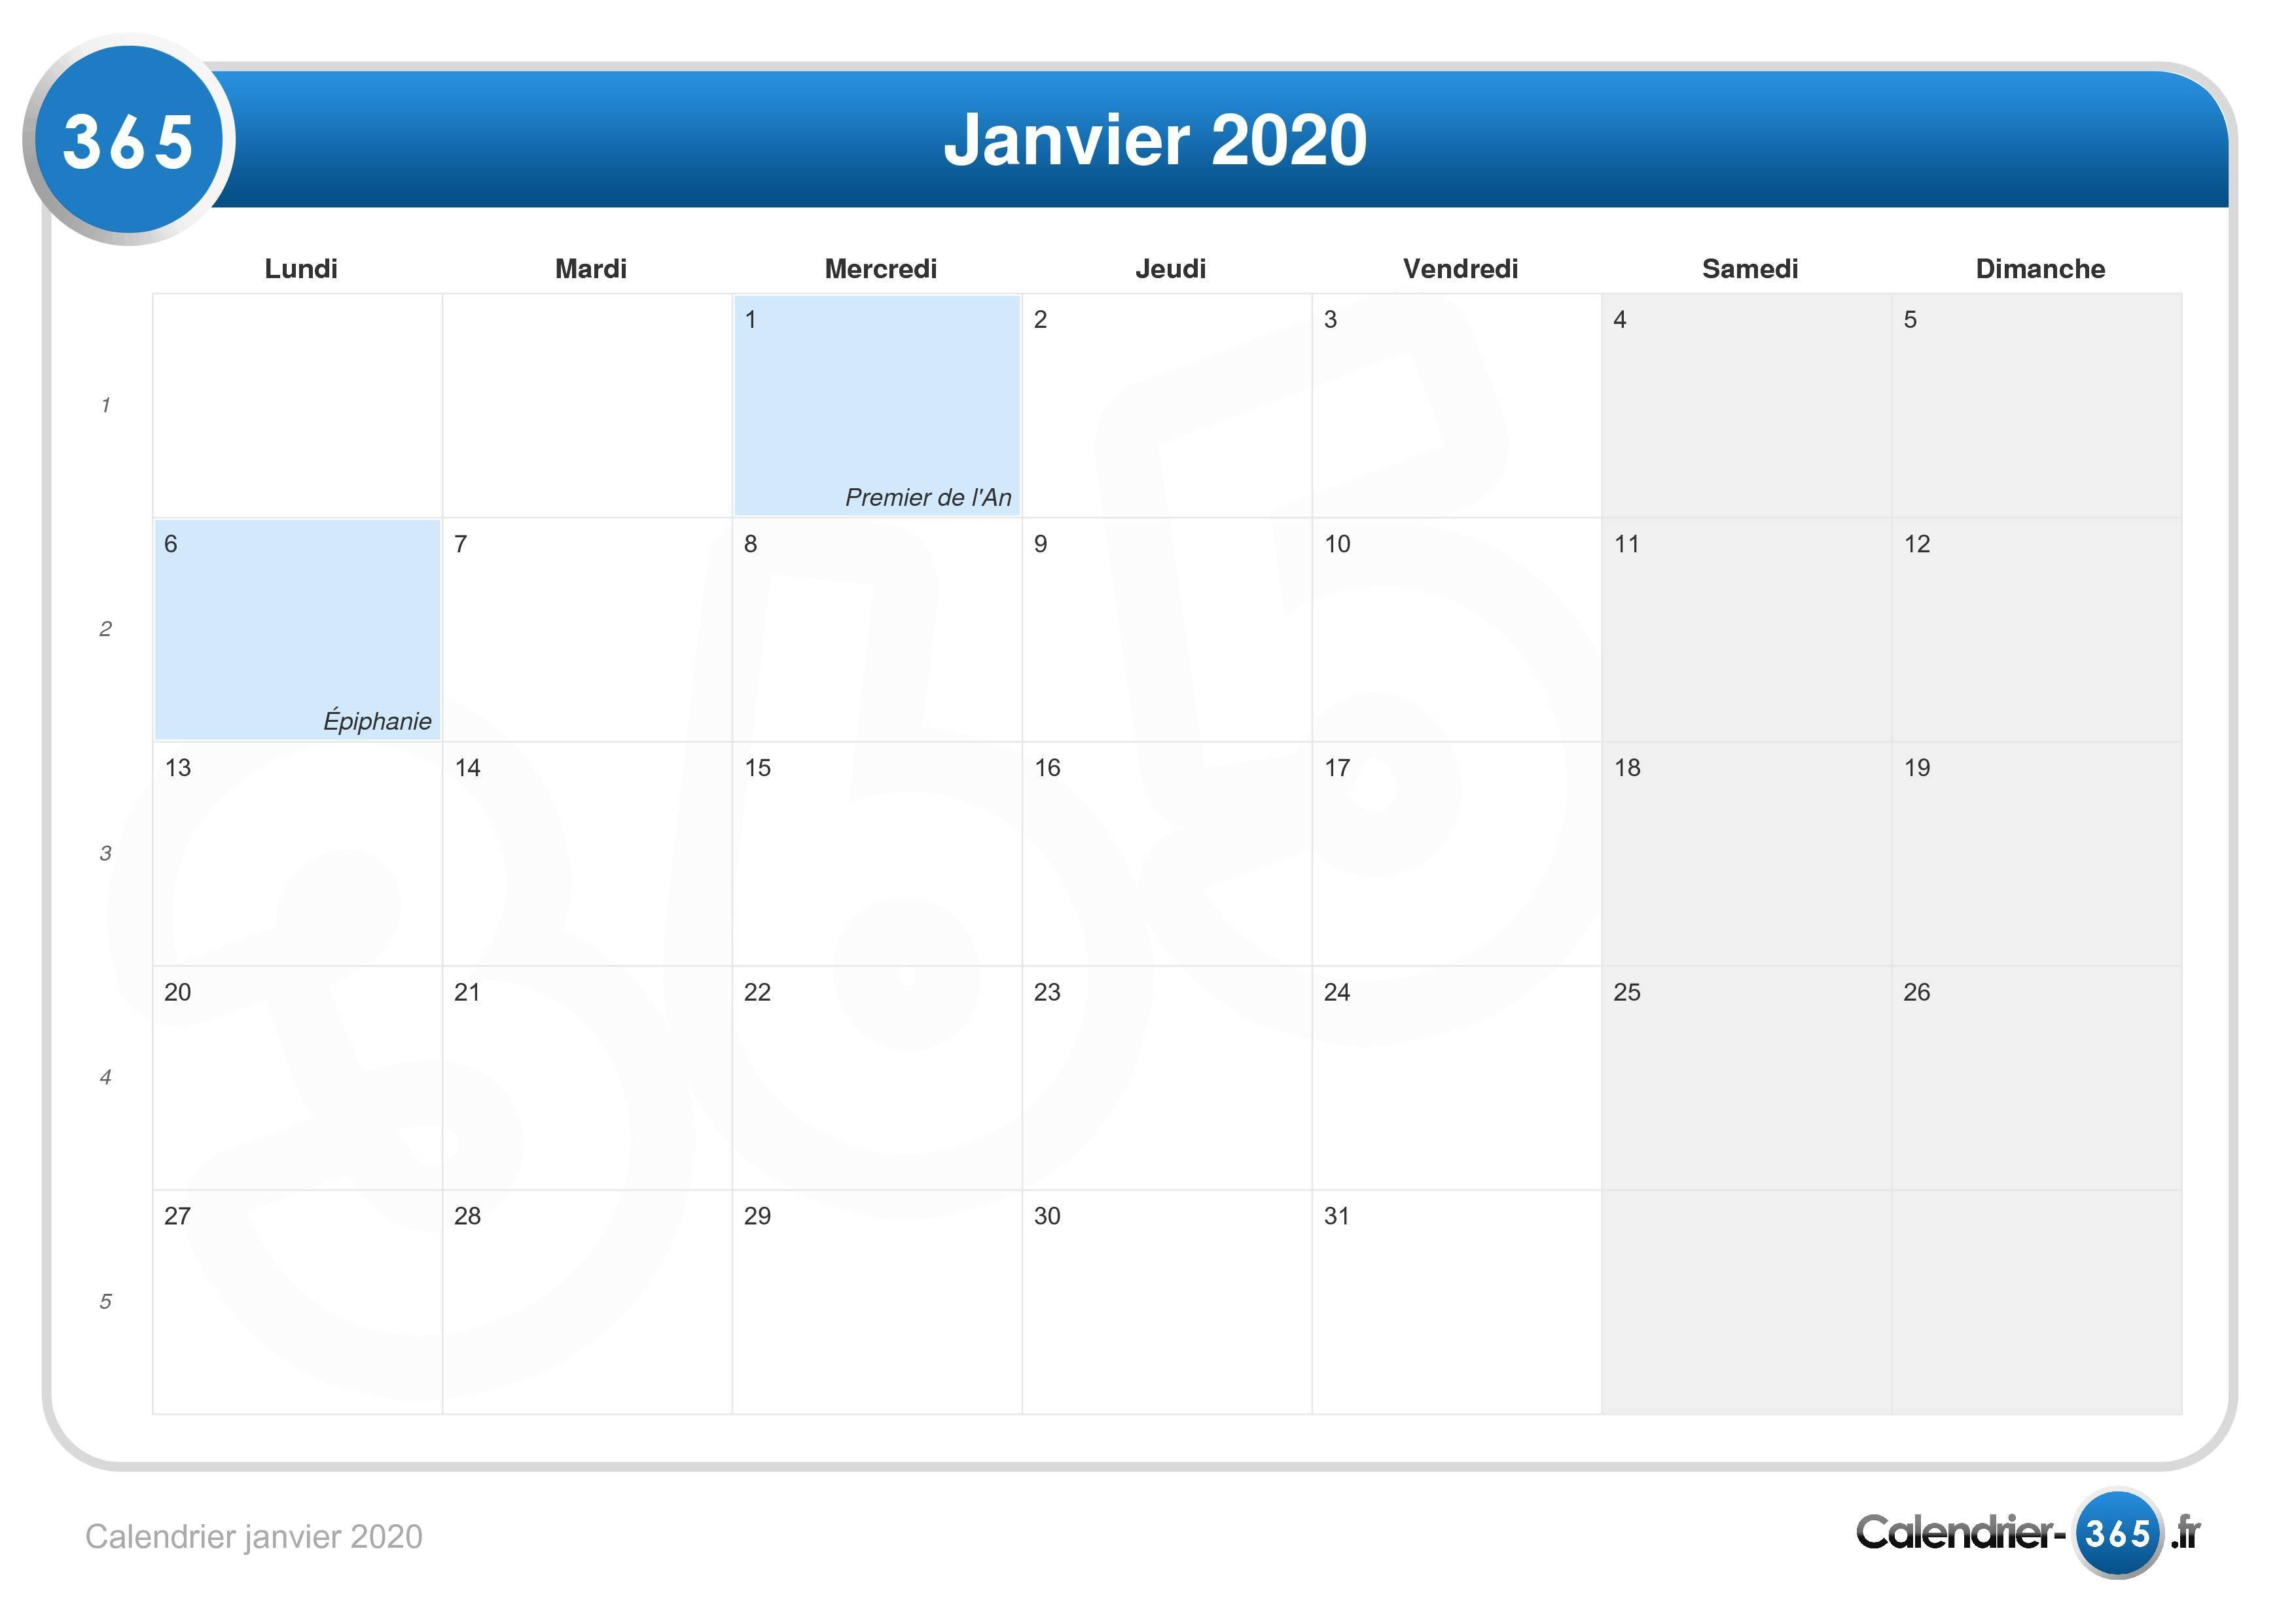 Salon Villepinte Calendrier 2020.Calendrier Janvier 2020